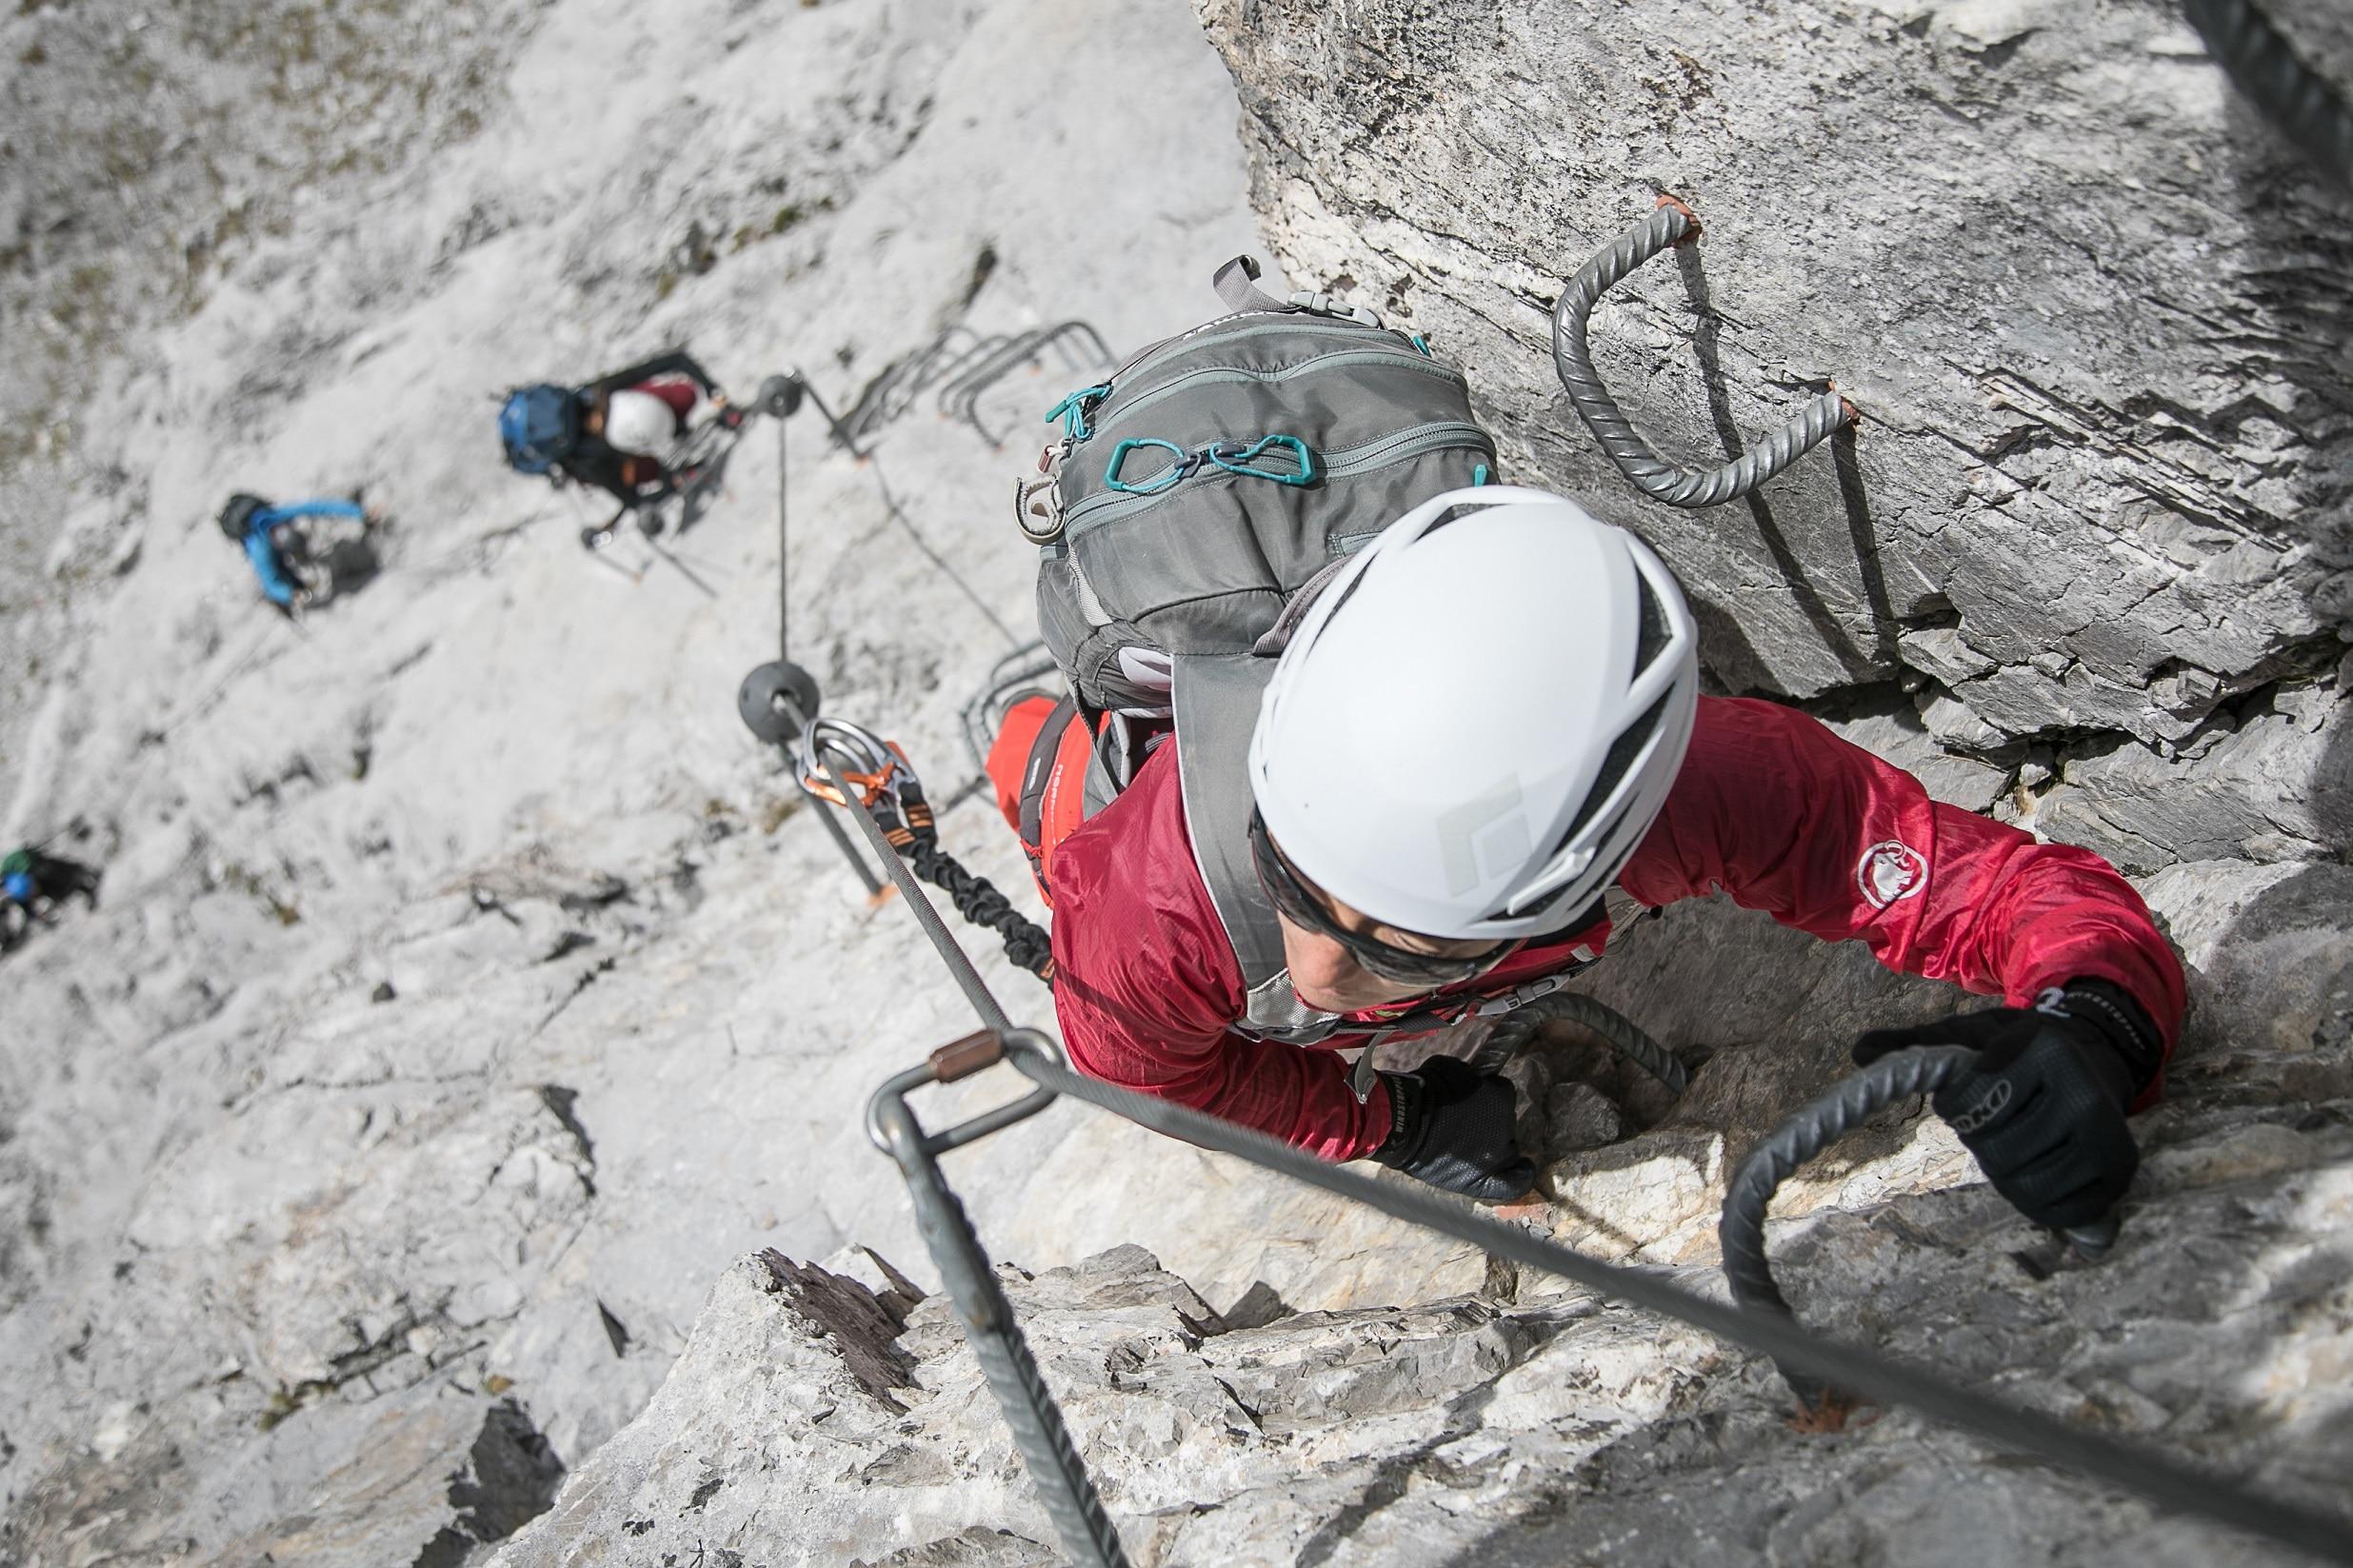 Klettersteig Sulzfluh : Klettersteige sulzfluh km bergwelten